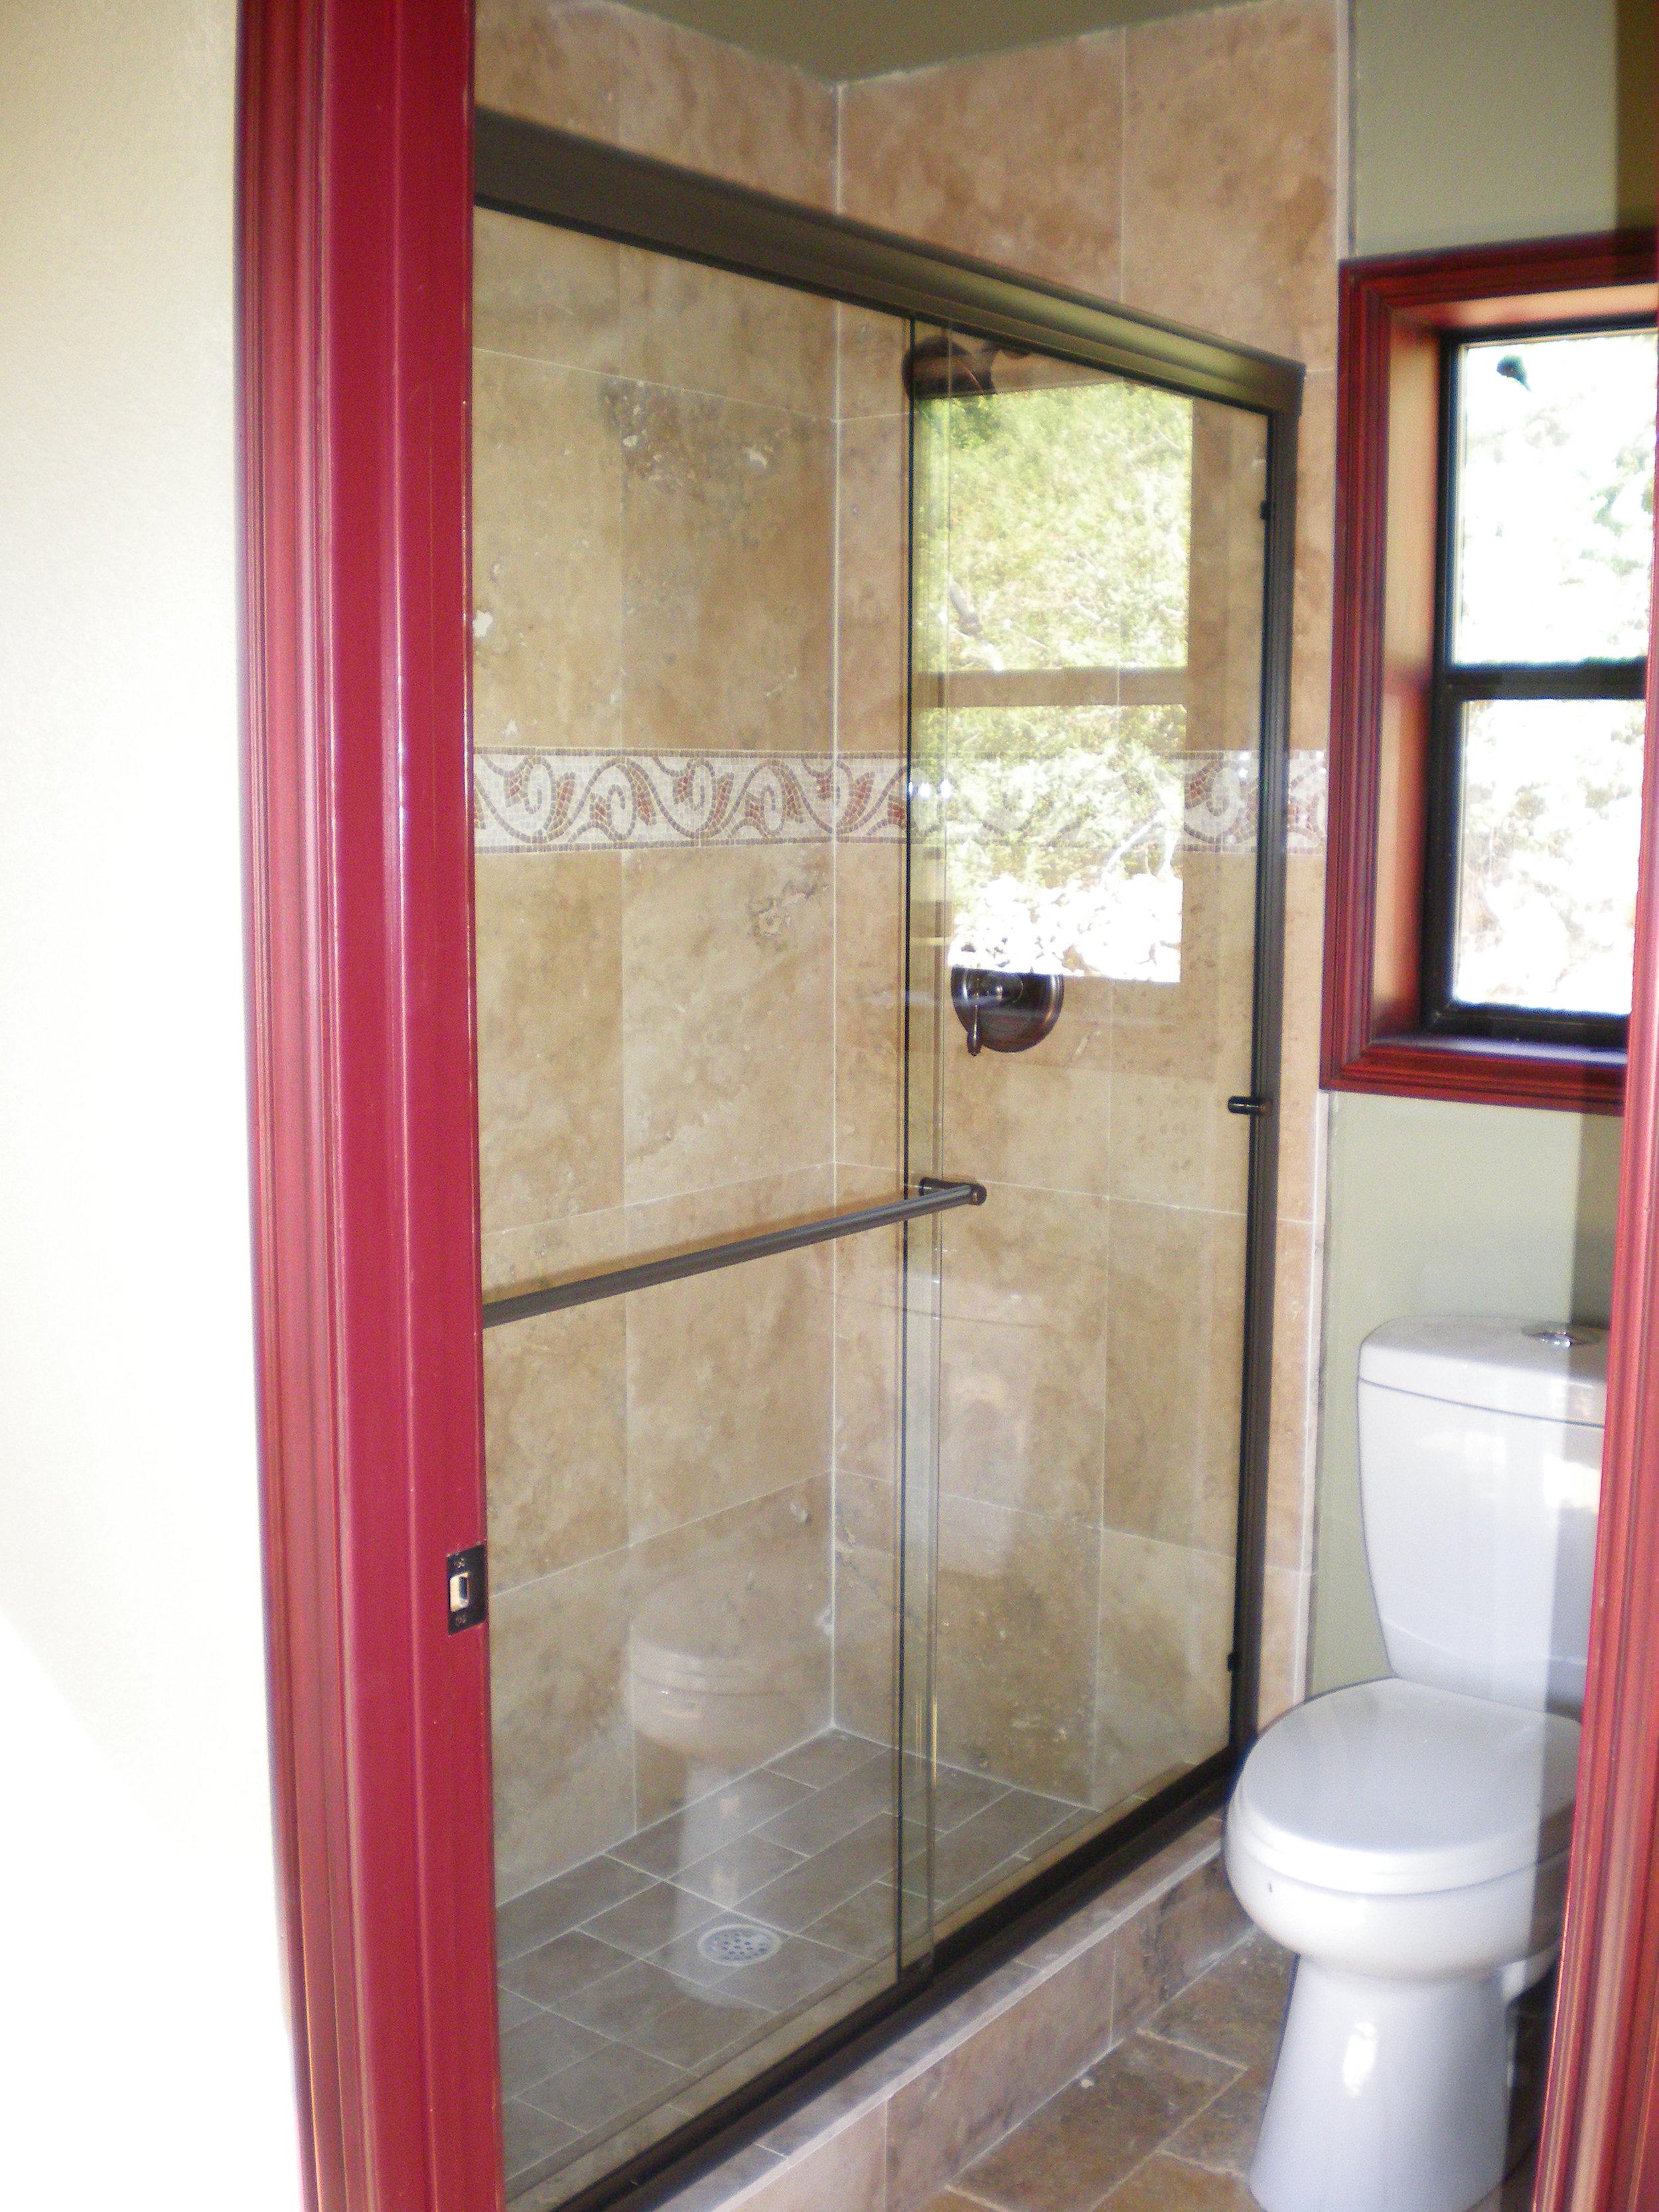 Shower-Doors-Residential-Photos-28.jpg